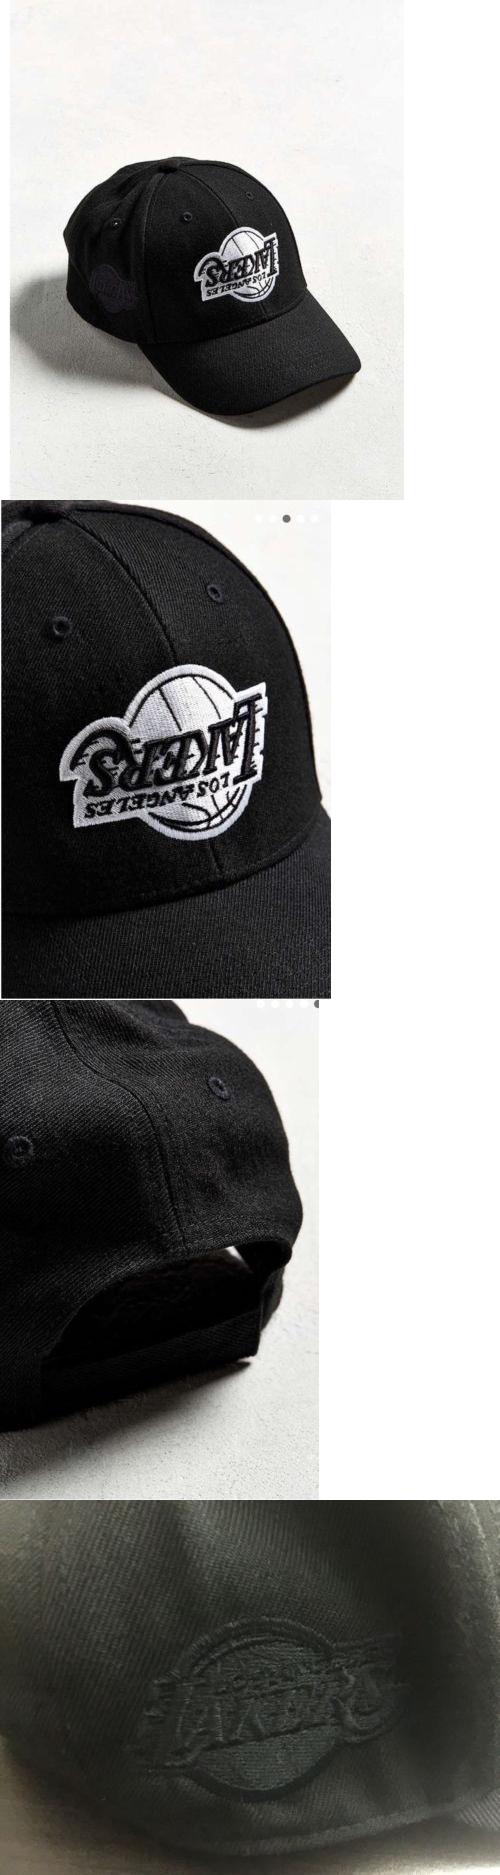 Hats 163543 Exclusive La Lakers Upside Down Logo Black White Cap Hat Adjustable Back Buy It Now Only 36 99 On Ebay White Caps Hats Caps Hats